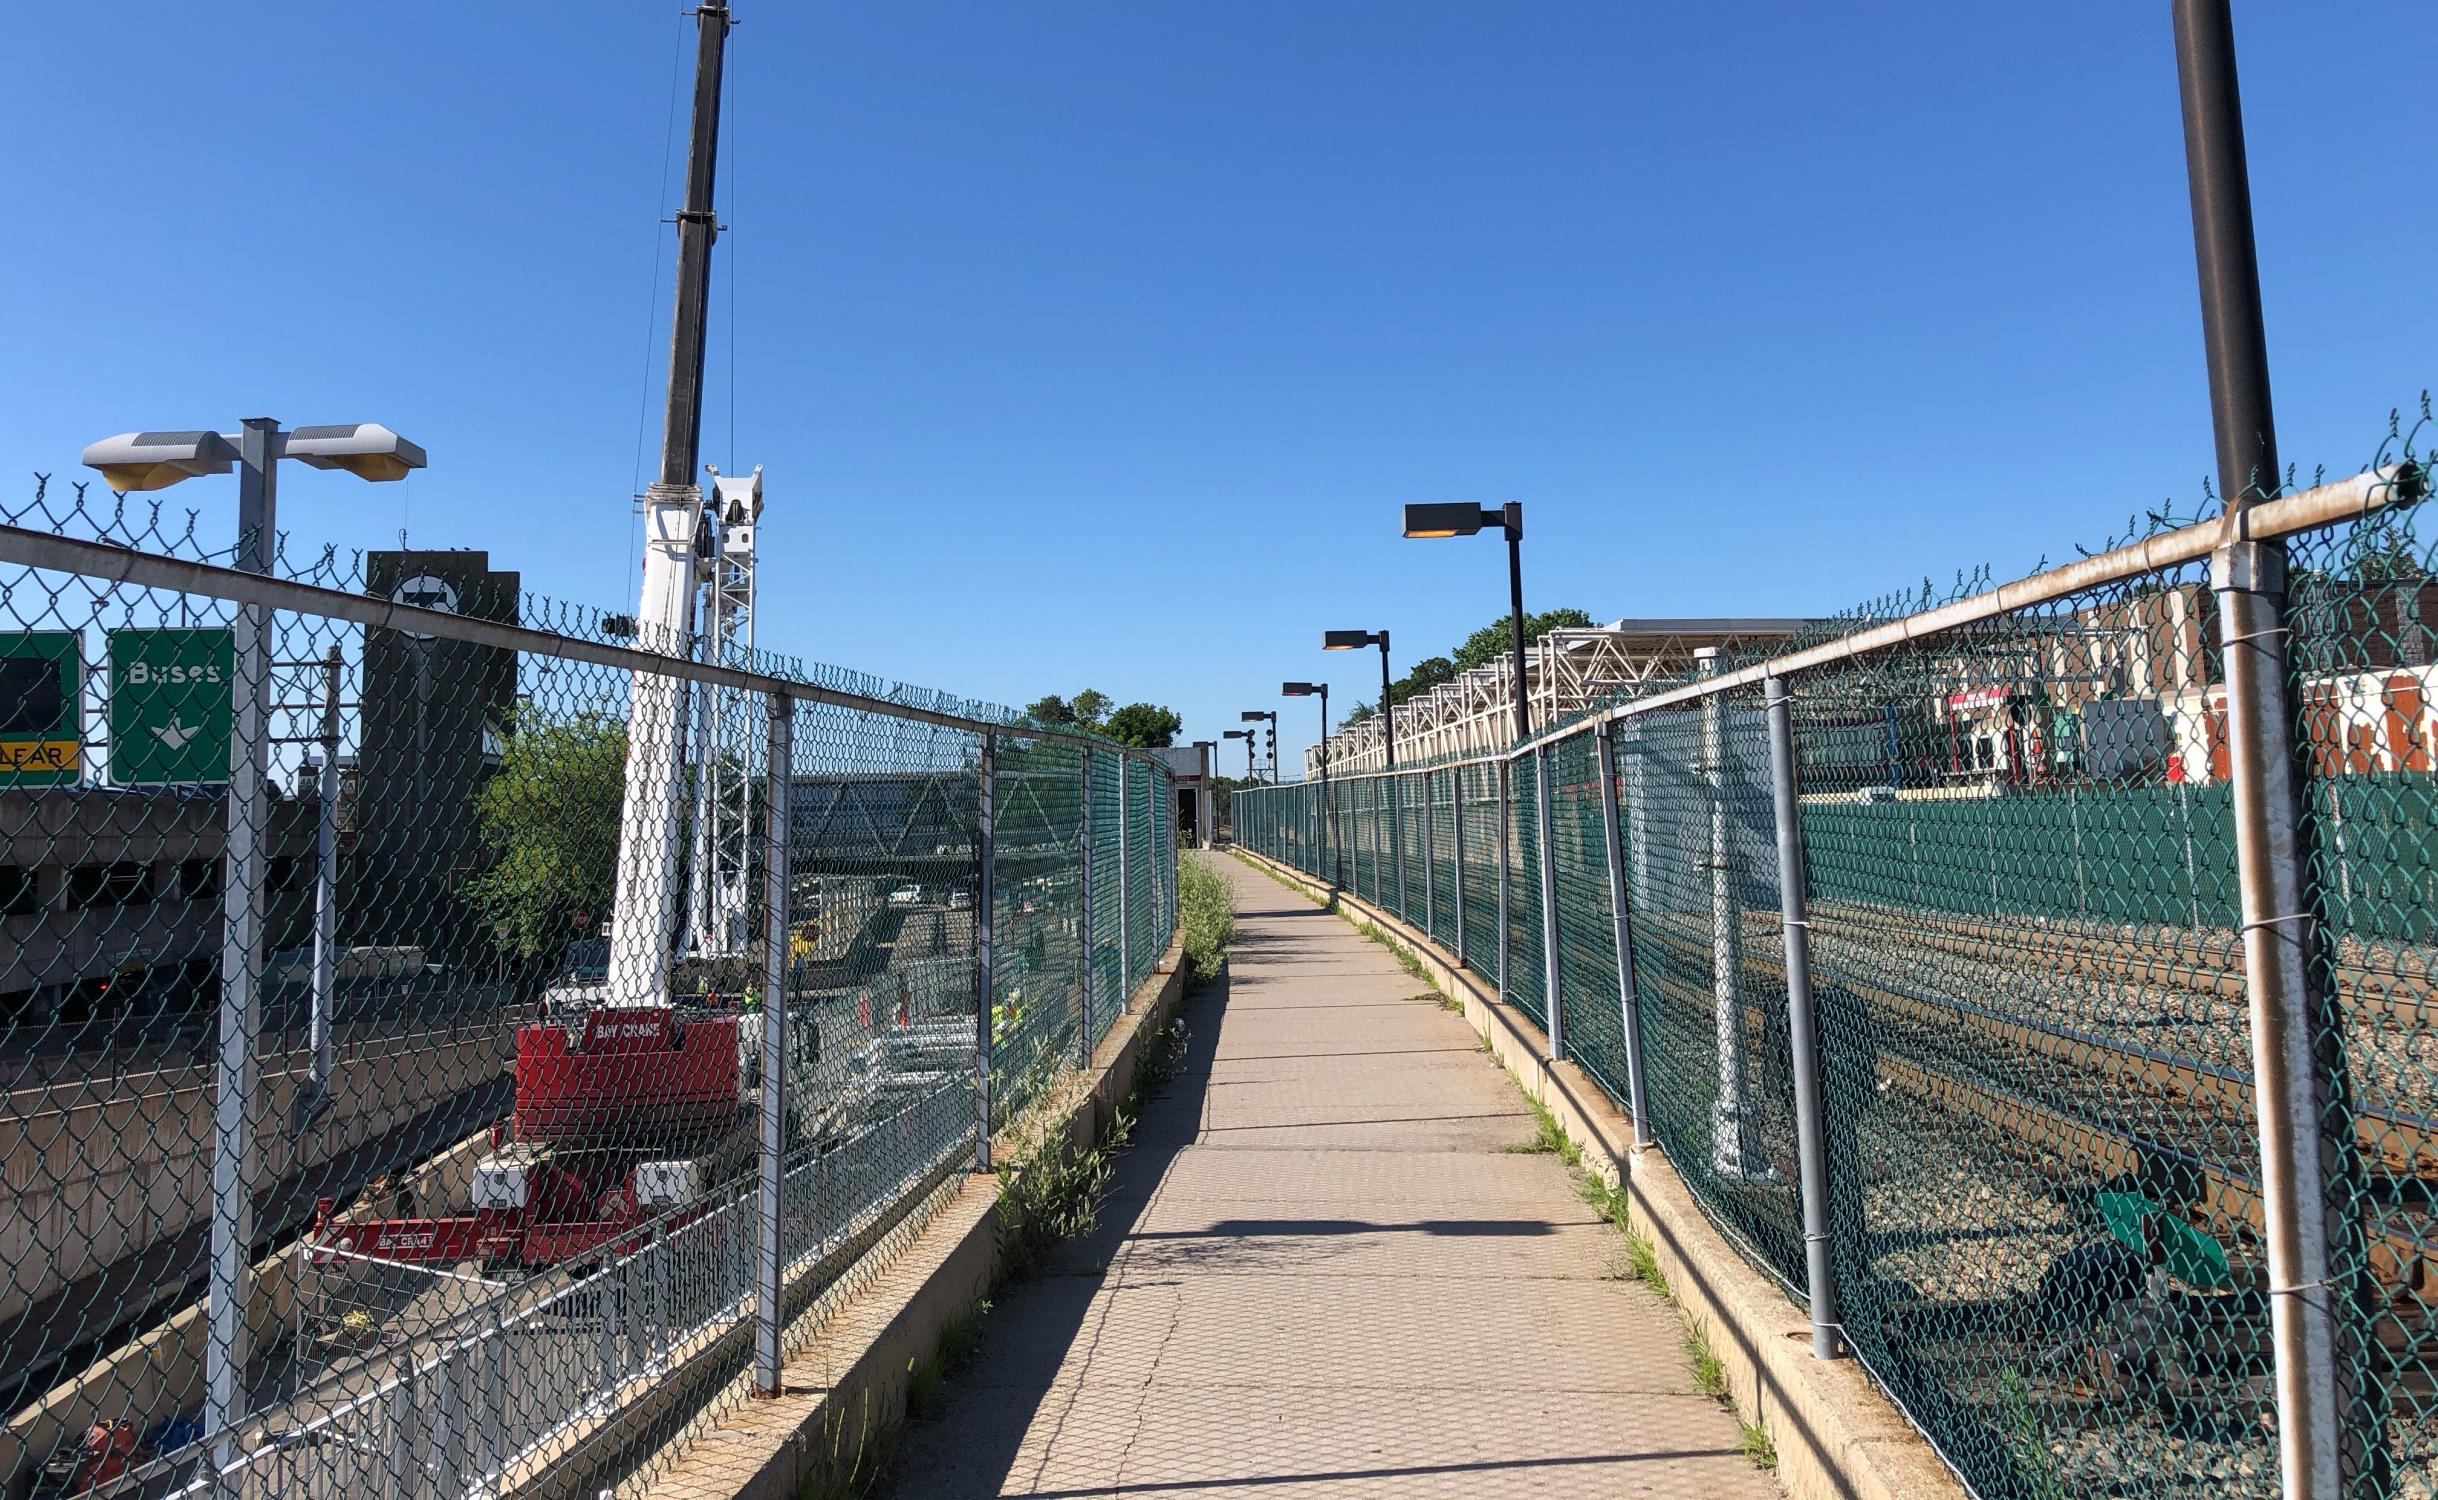 Temporary ramp to the Commuter Rail platform.